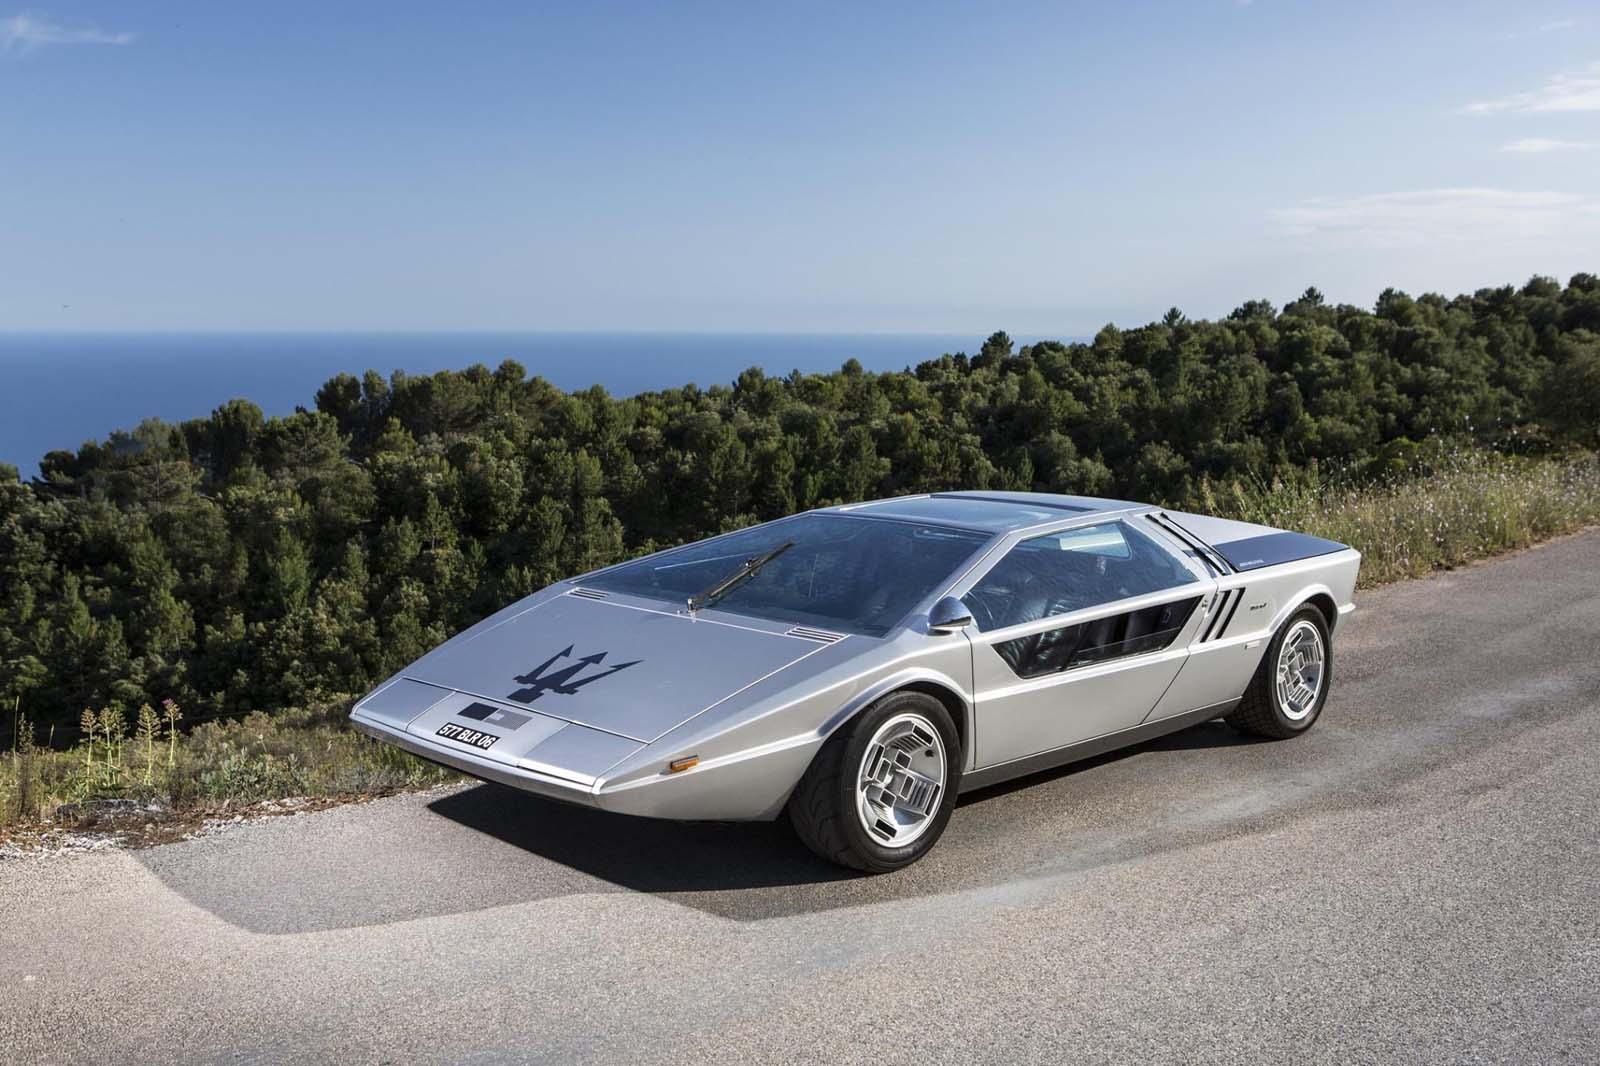 Concept Cars For Sale >> 1972 Maserati Boomerang Concept Car For Sale At Bonhams